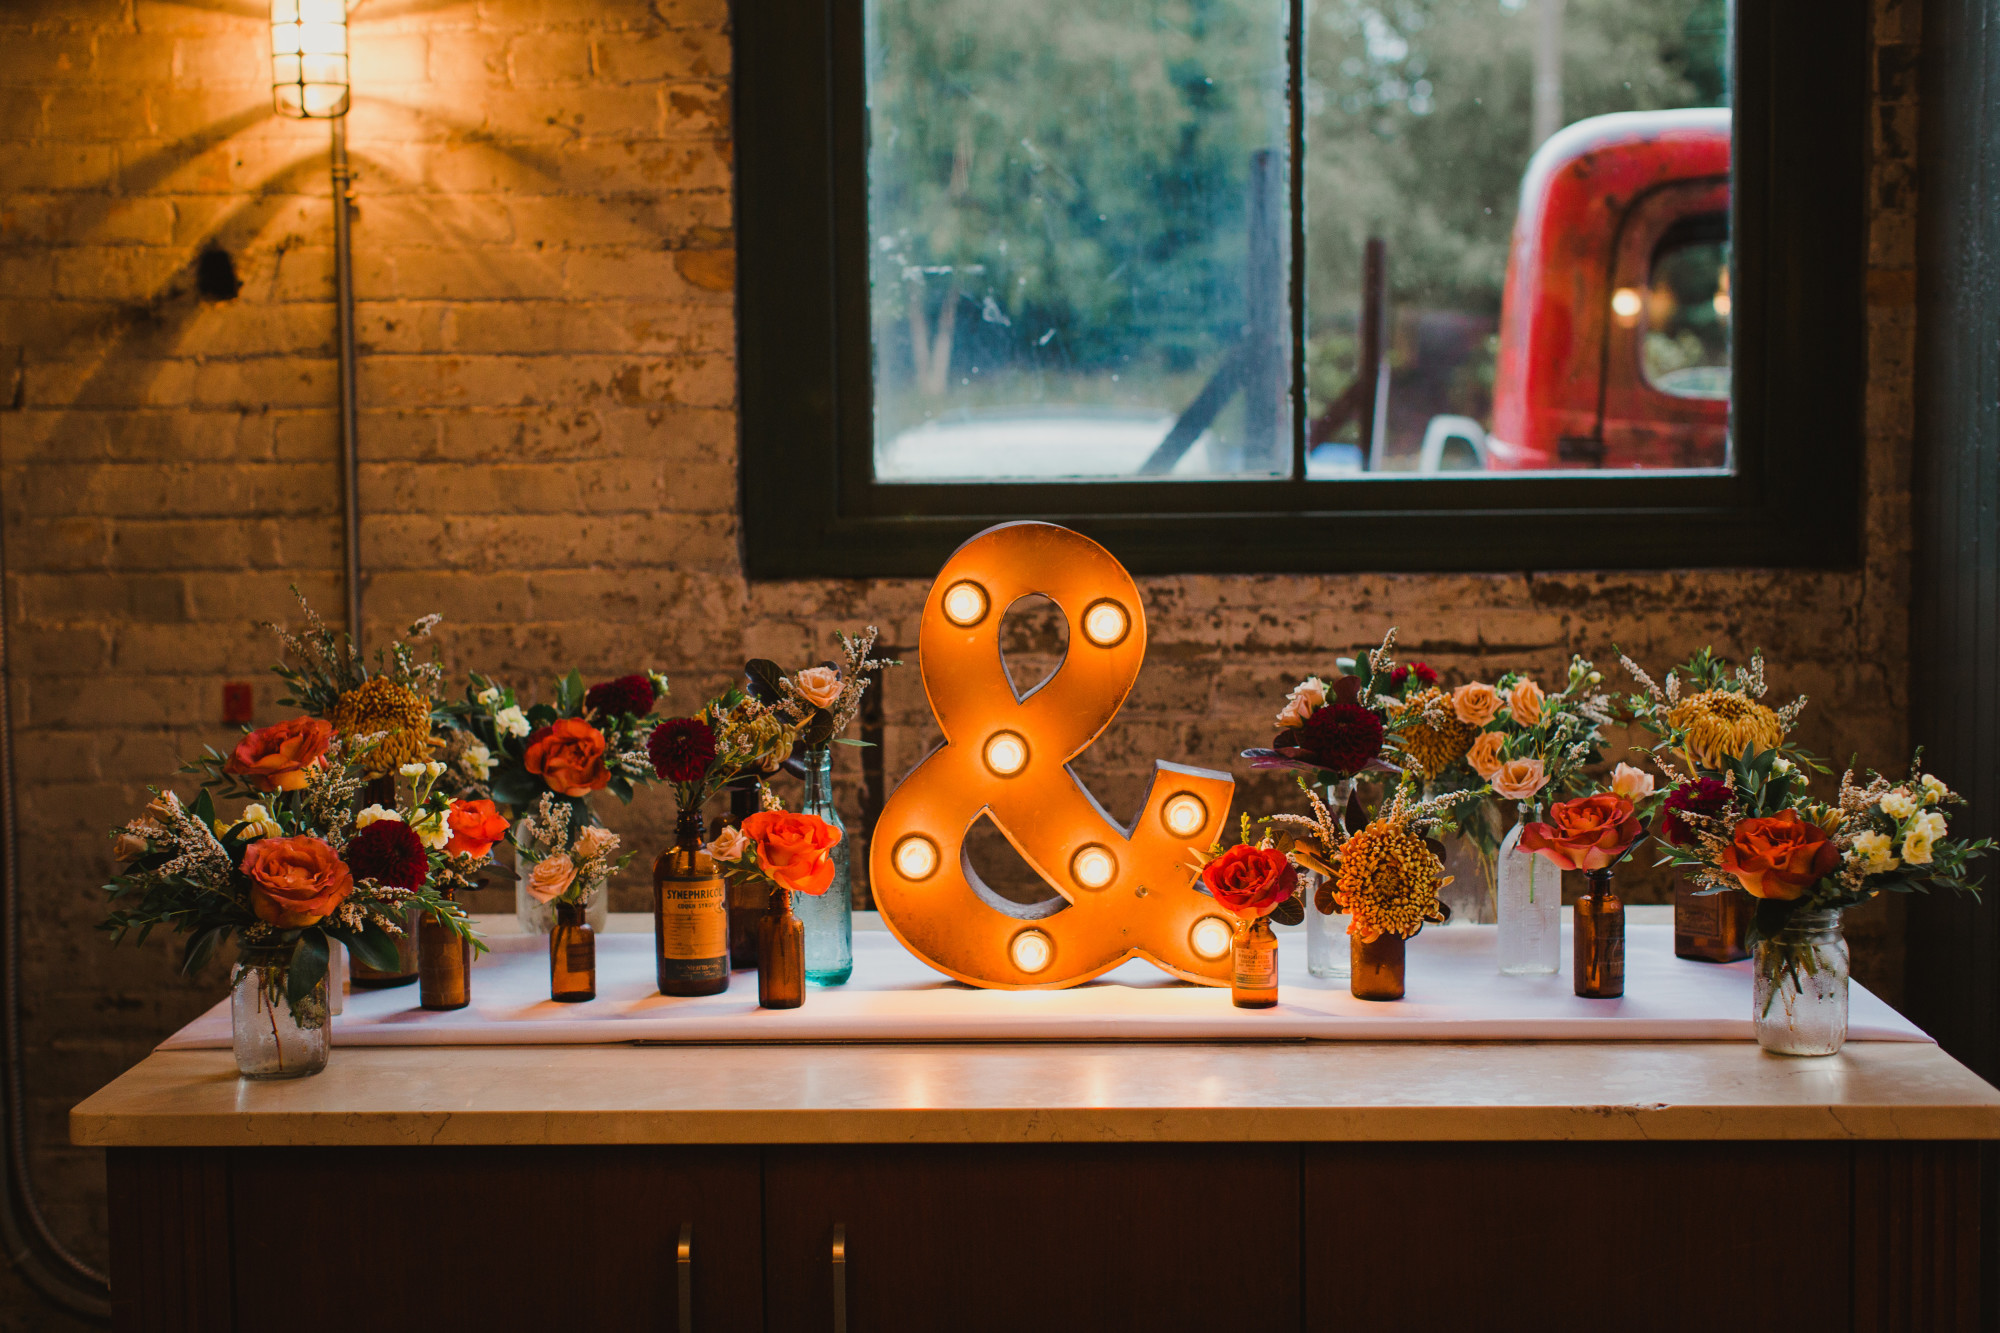 Beth-Ted-Balzacs-Coffee-Distillery-District-Toronto-Wedding-Planning-INLY-Events-Lushana-Bale-Photography-099.jpg